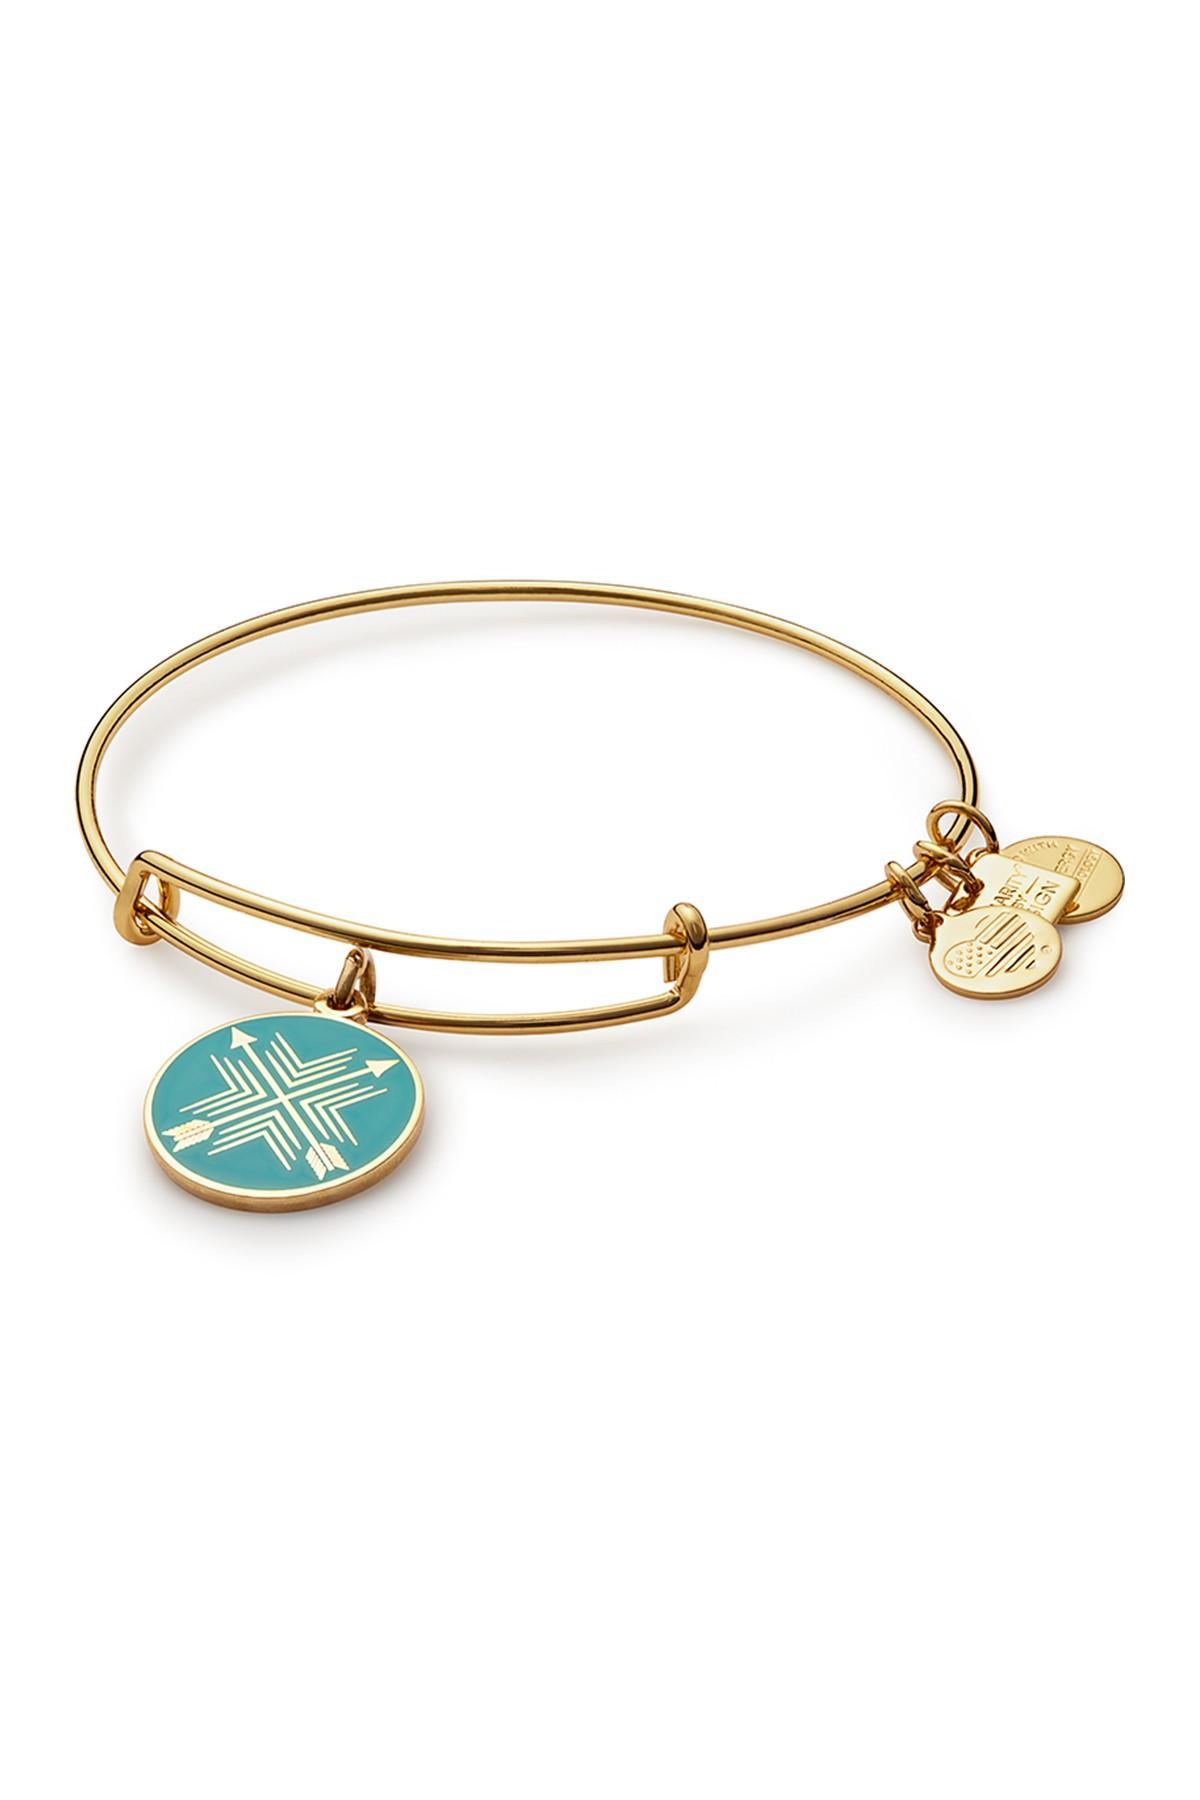 a70c00034e706 Women's Metallic Charity By Design Arrows Of Friendship Charm Bangle